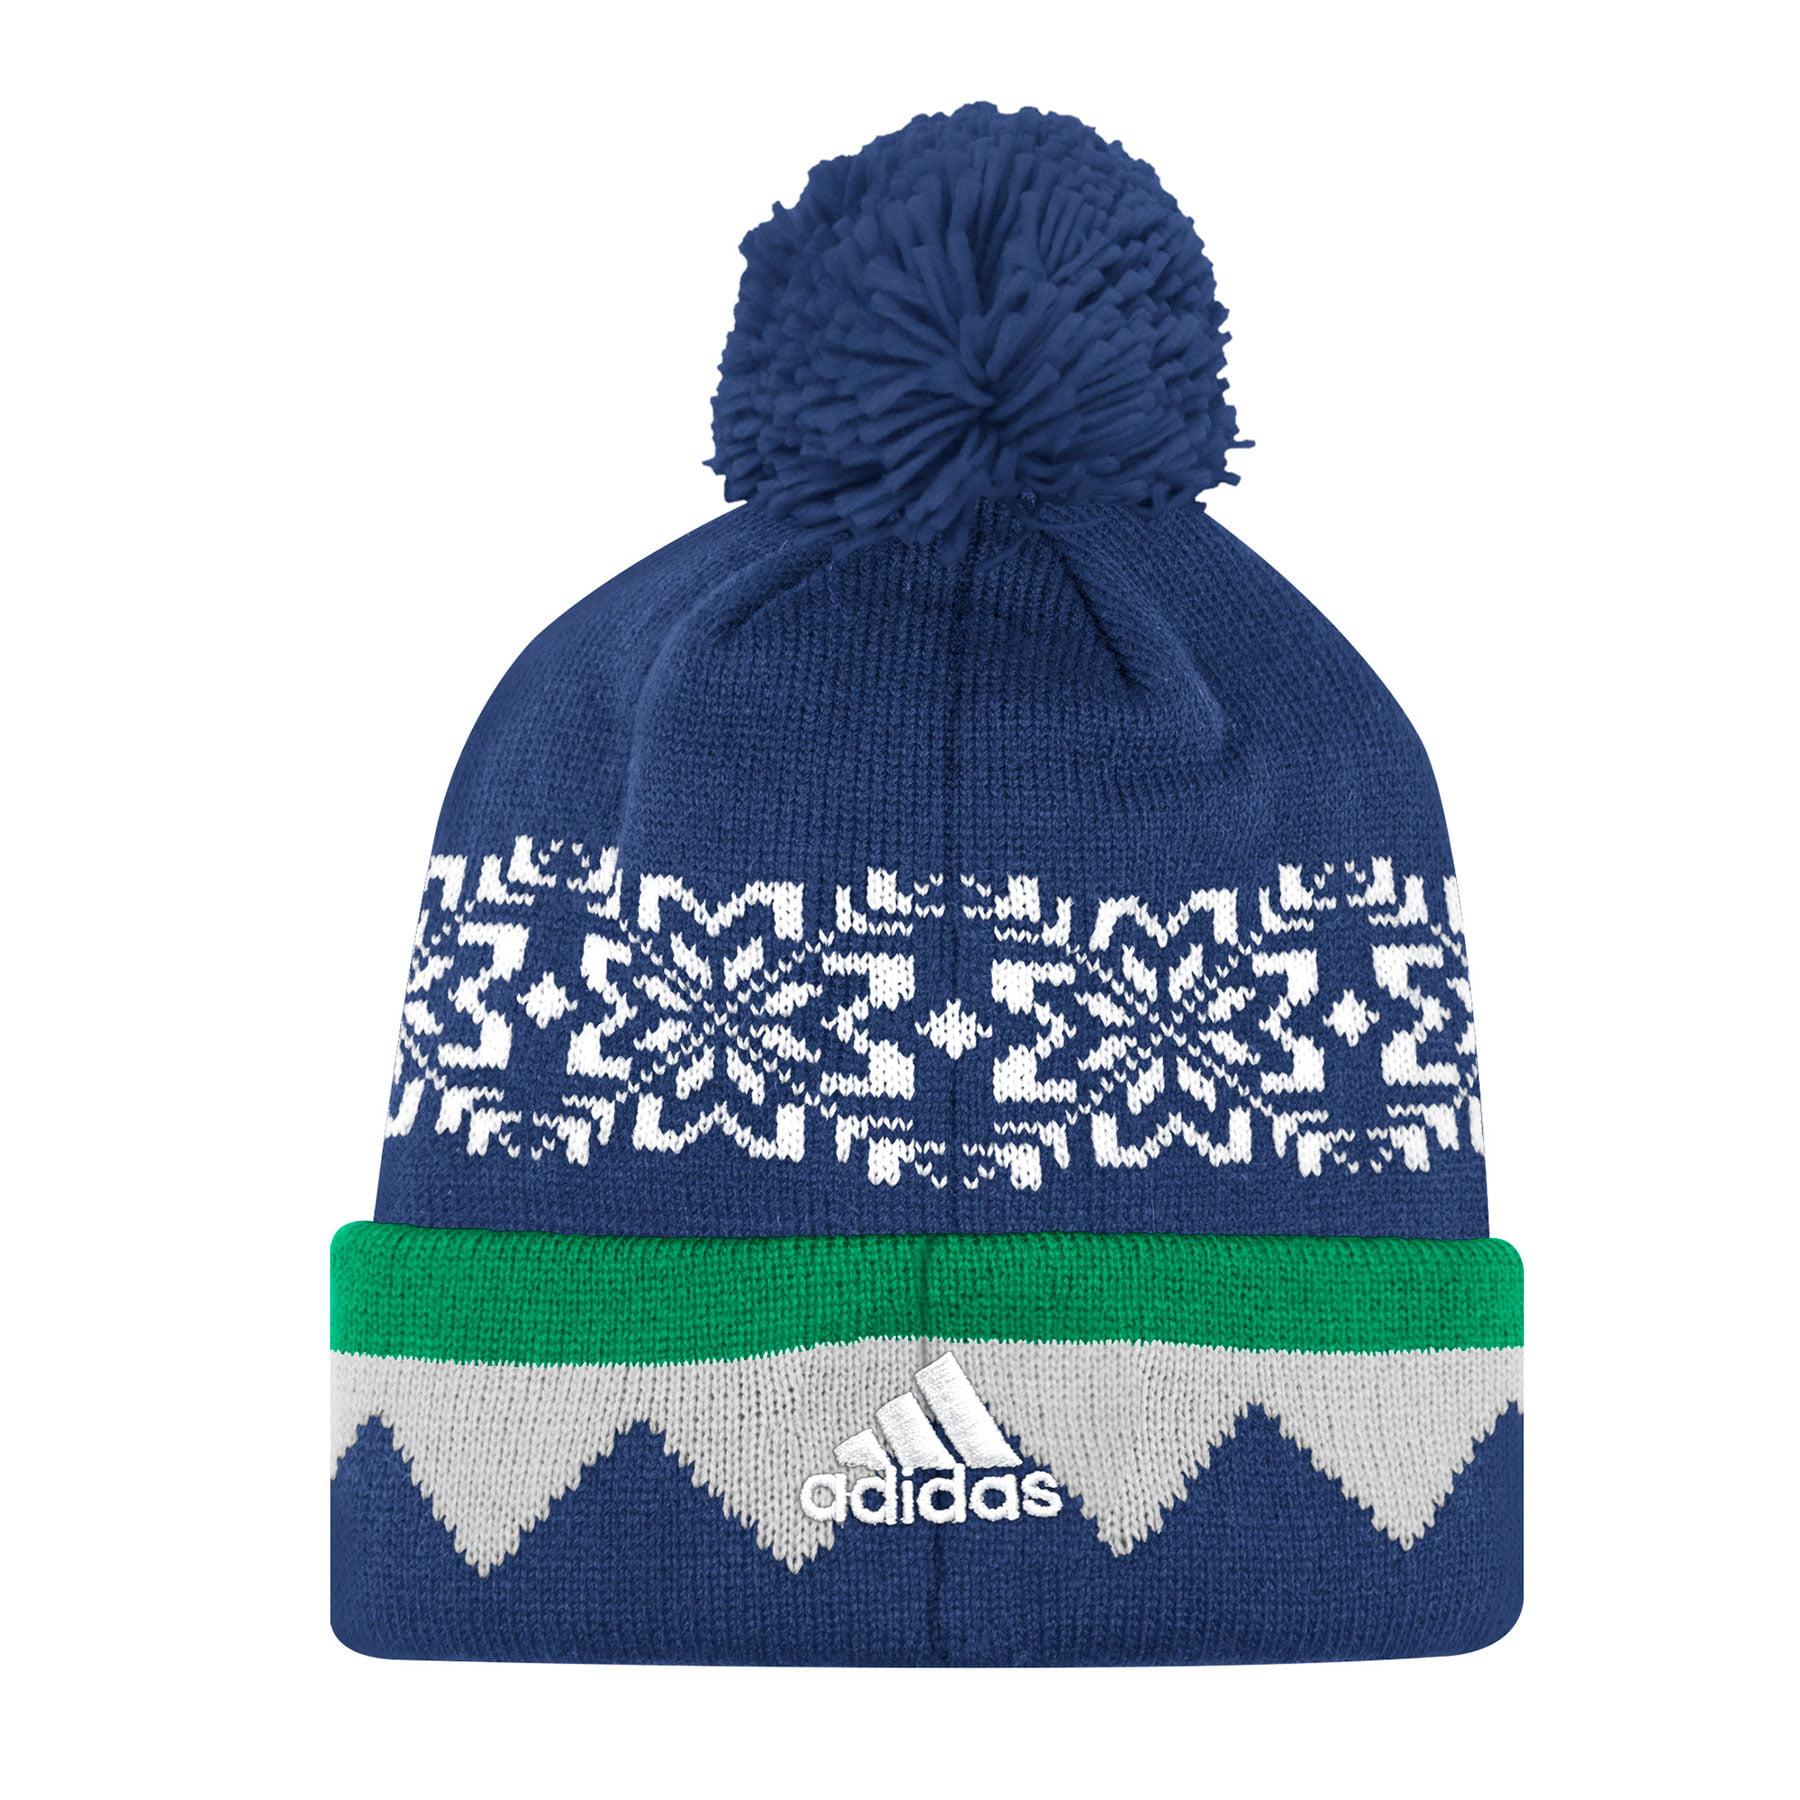 Vancouver Canucks Adidas NHL Snowflake Cuffed Pom Knit Hat e1cd873e759